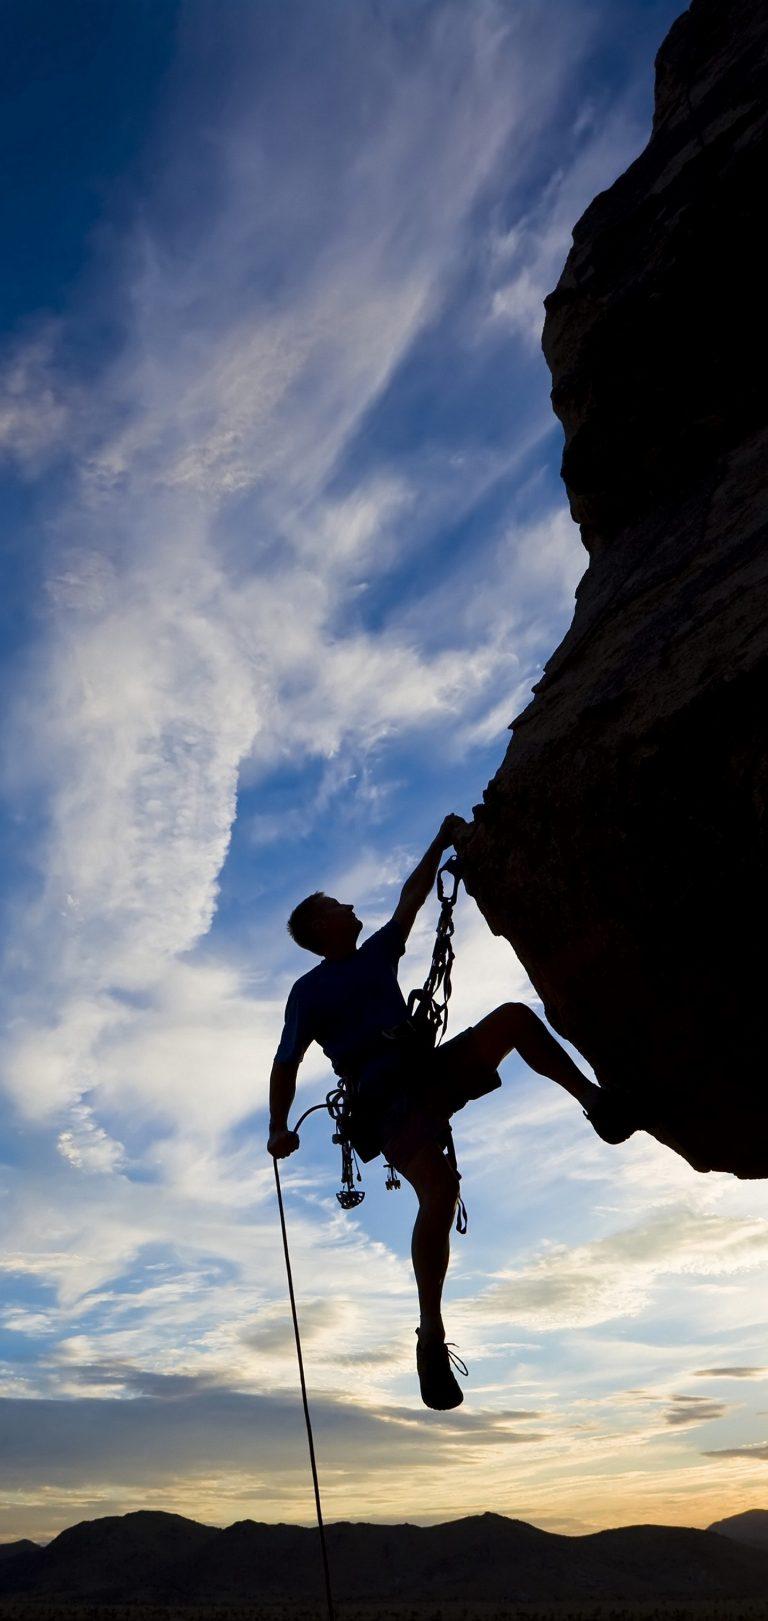 Climber Extreme Silhouette Climbing Wallpaper 1440x3040 768x1621